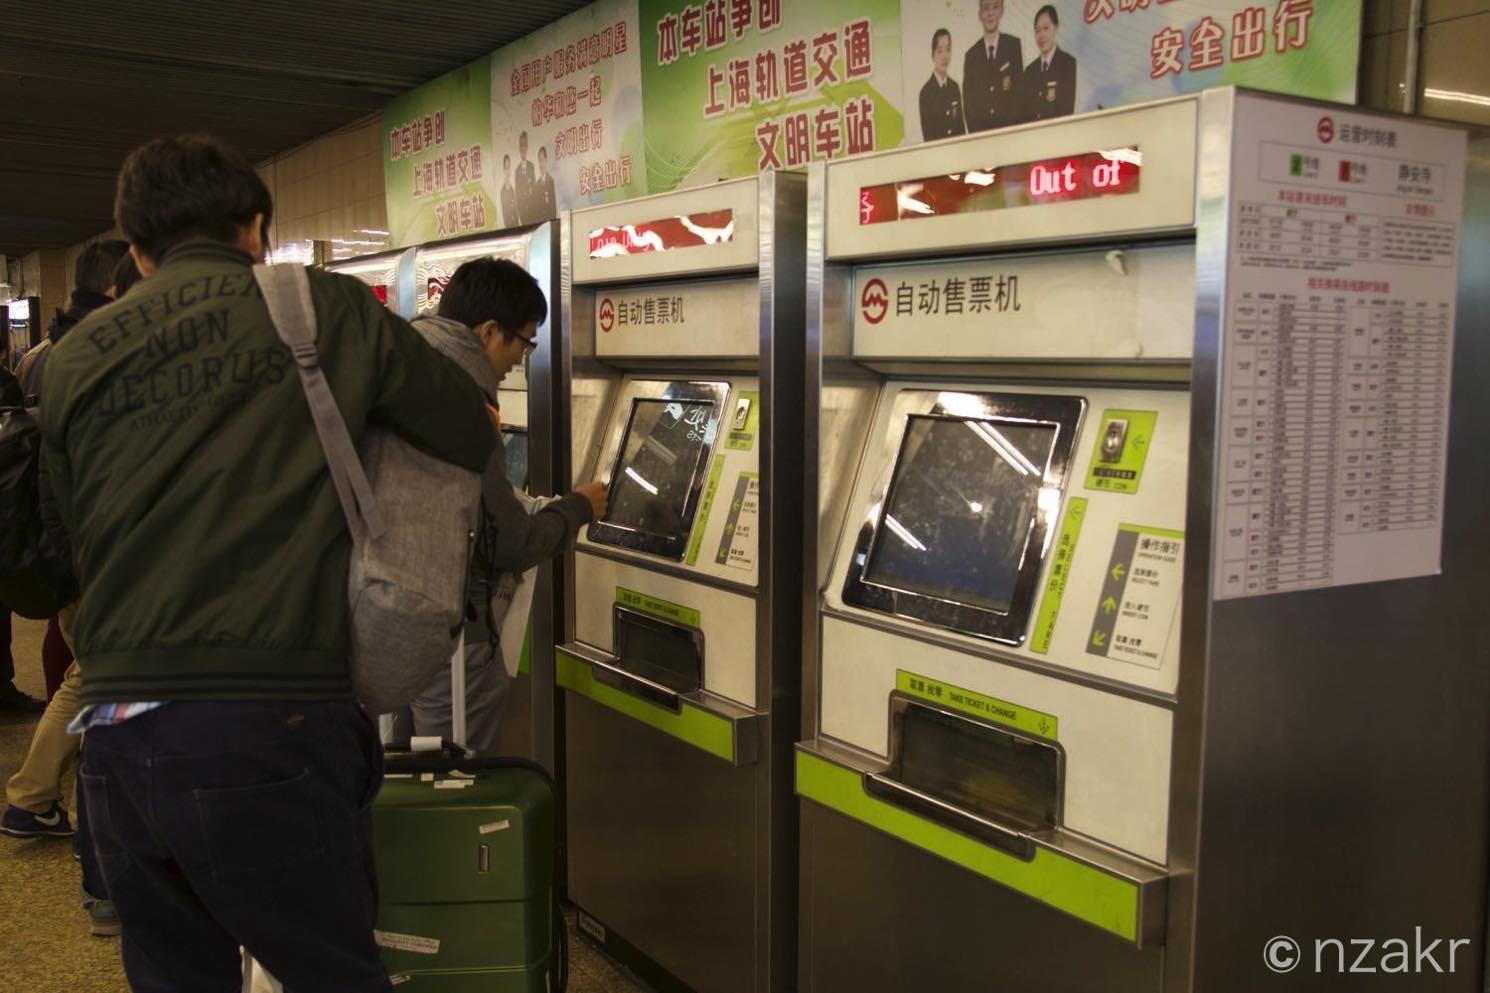 上海地下鉄の券売機